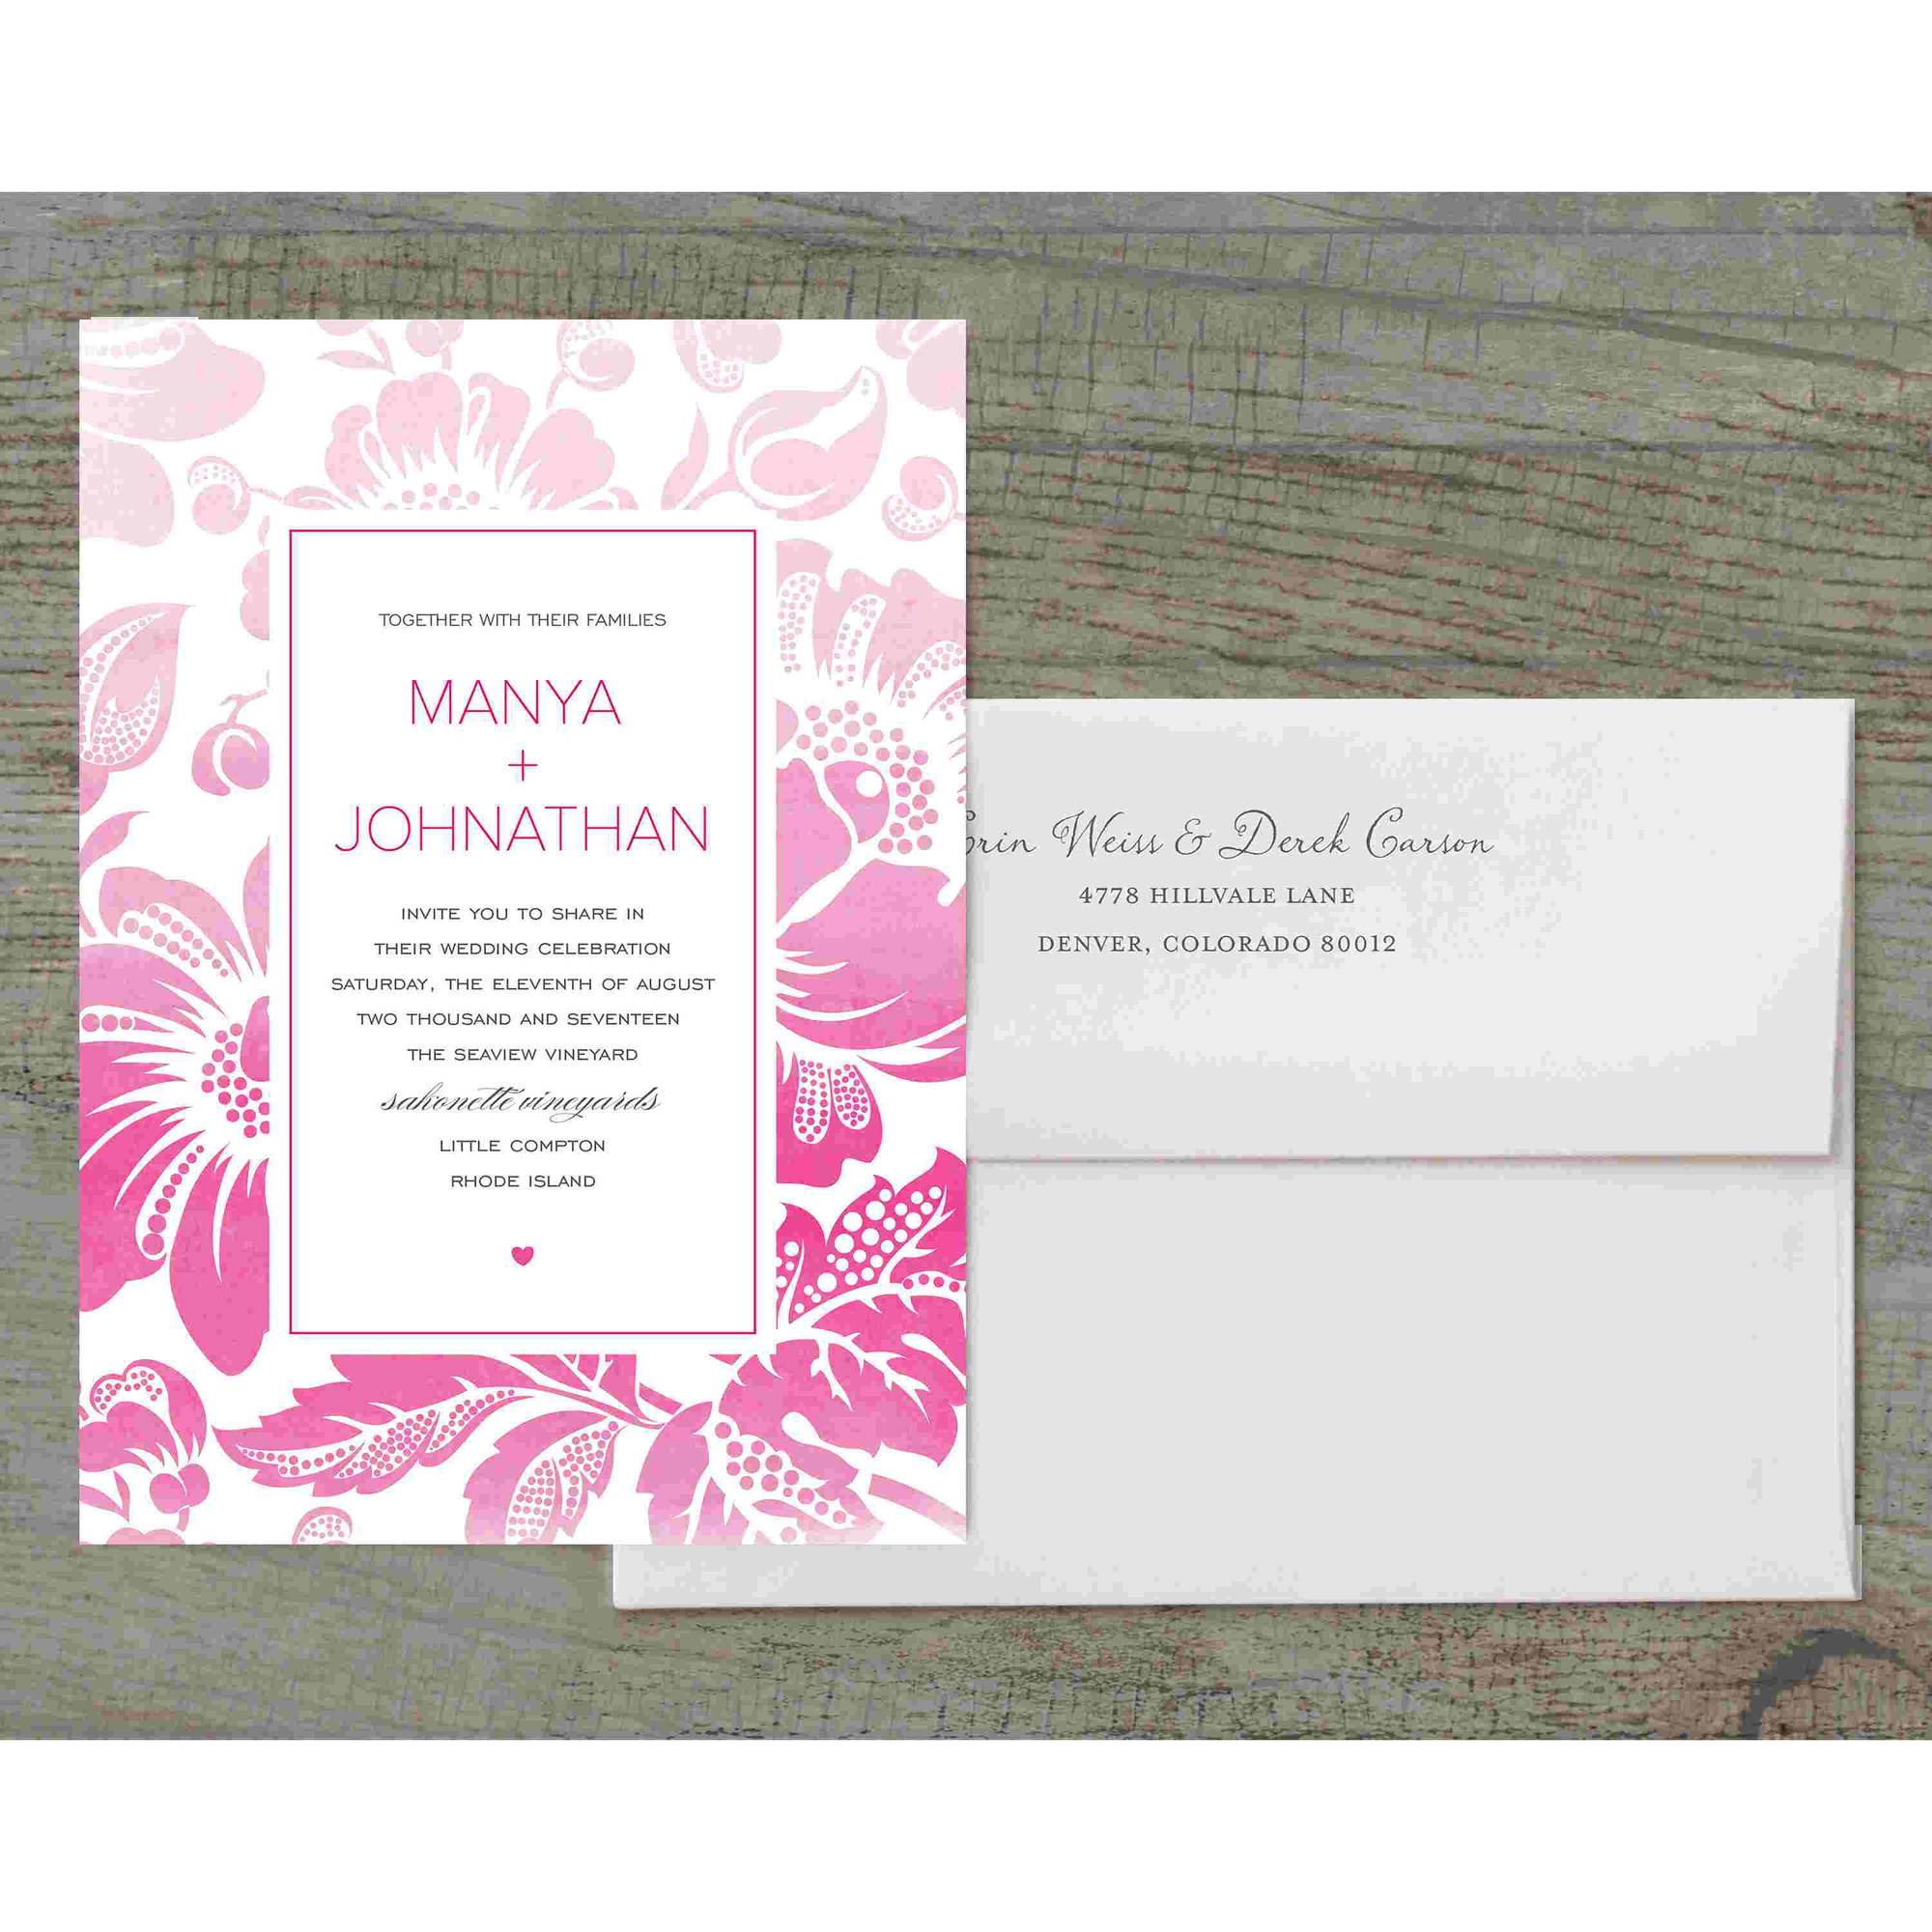 Ombre Floral Deluxe Wedding Invitation - Walmart.com